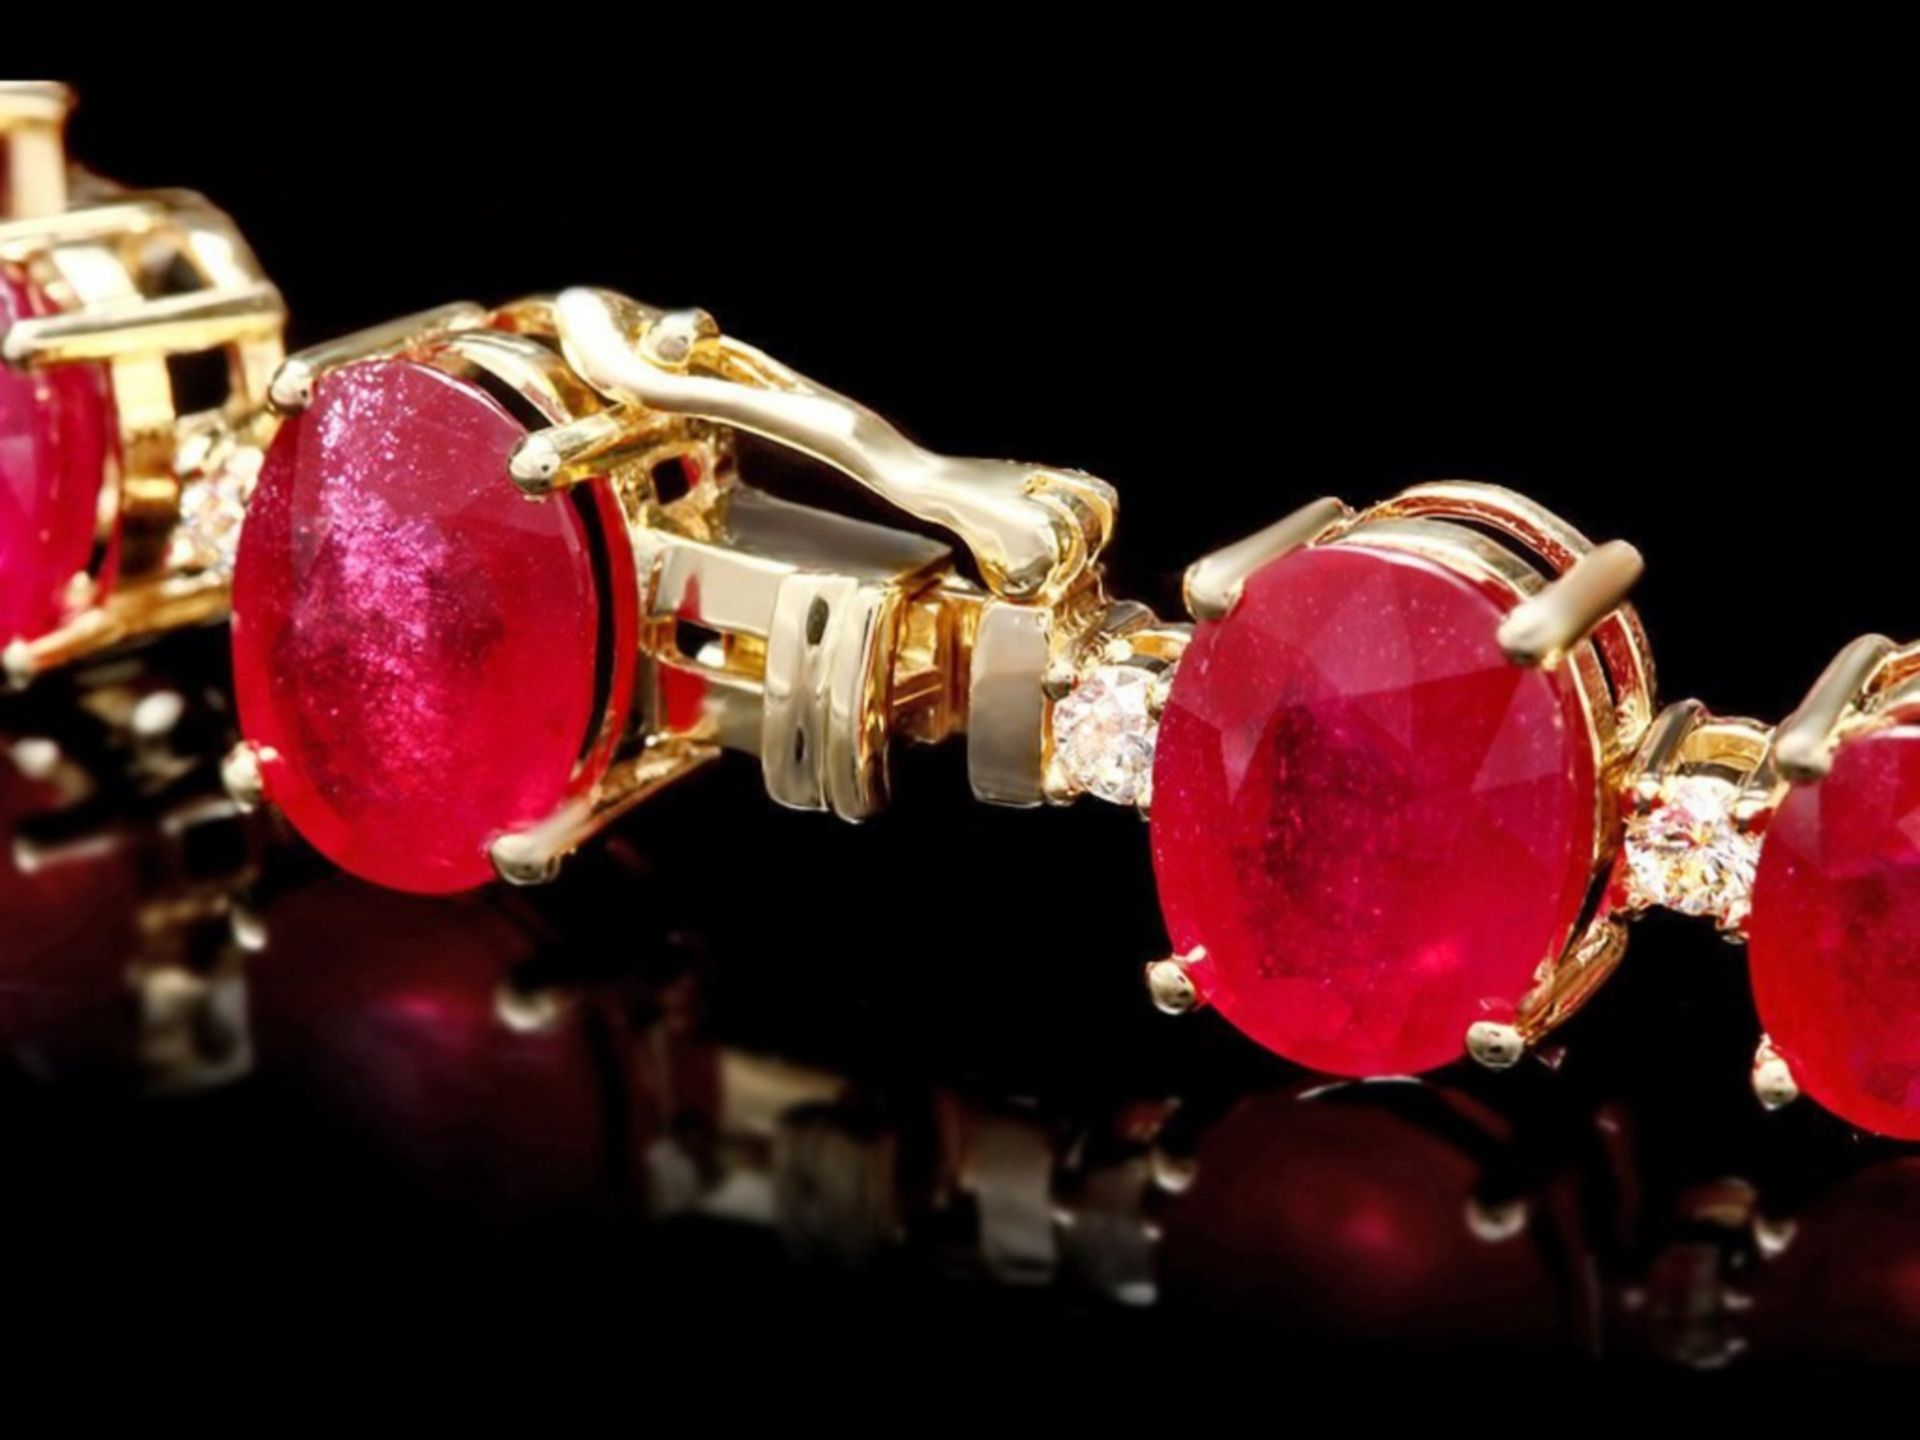 `14k Gold 50.00ct Ruby & 1.50ct Diamond Bracelet - Image 2 of 3